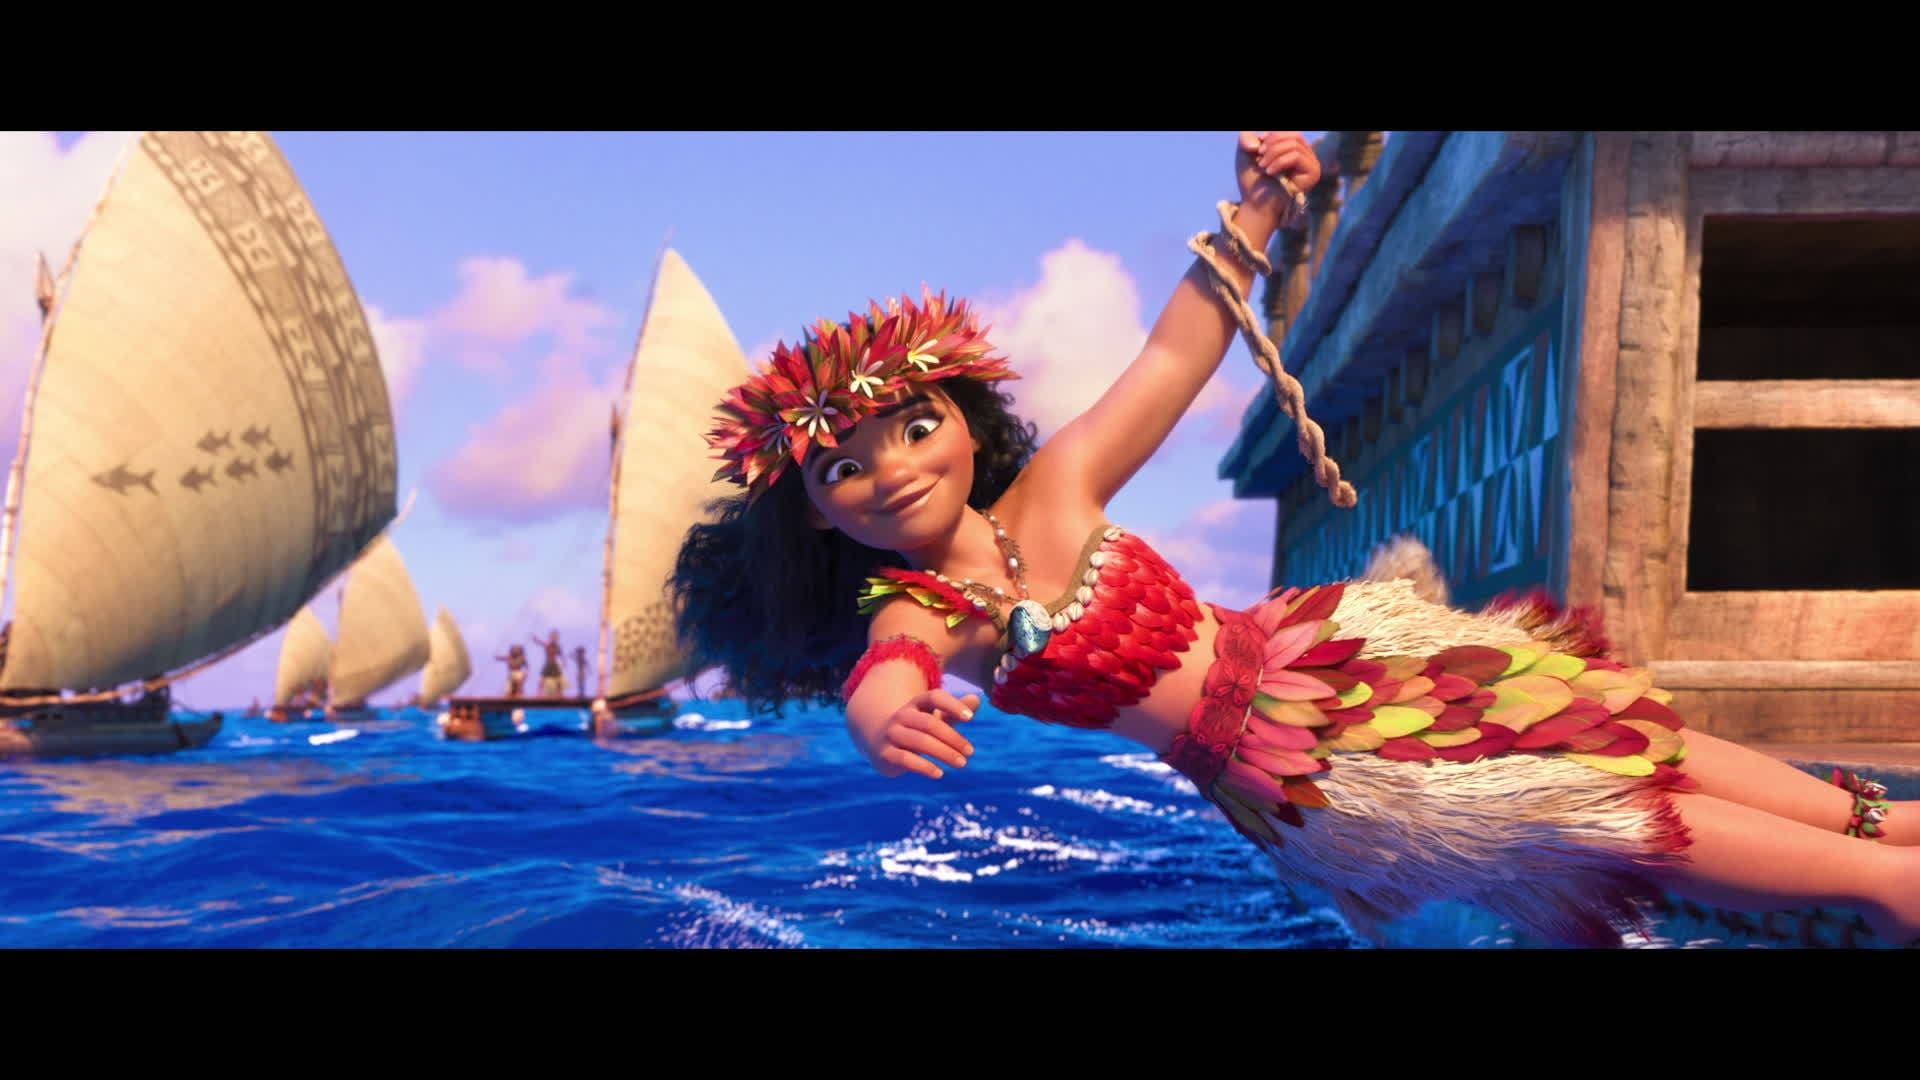 My Favorite Princess Story: Moana